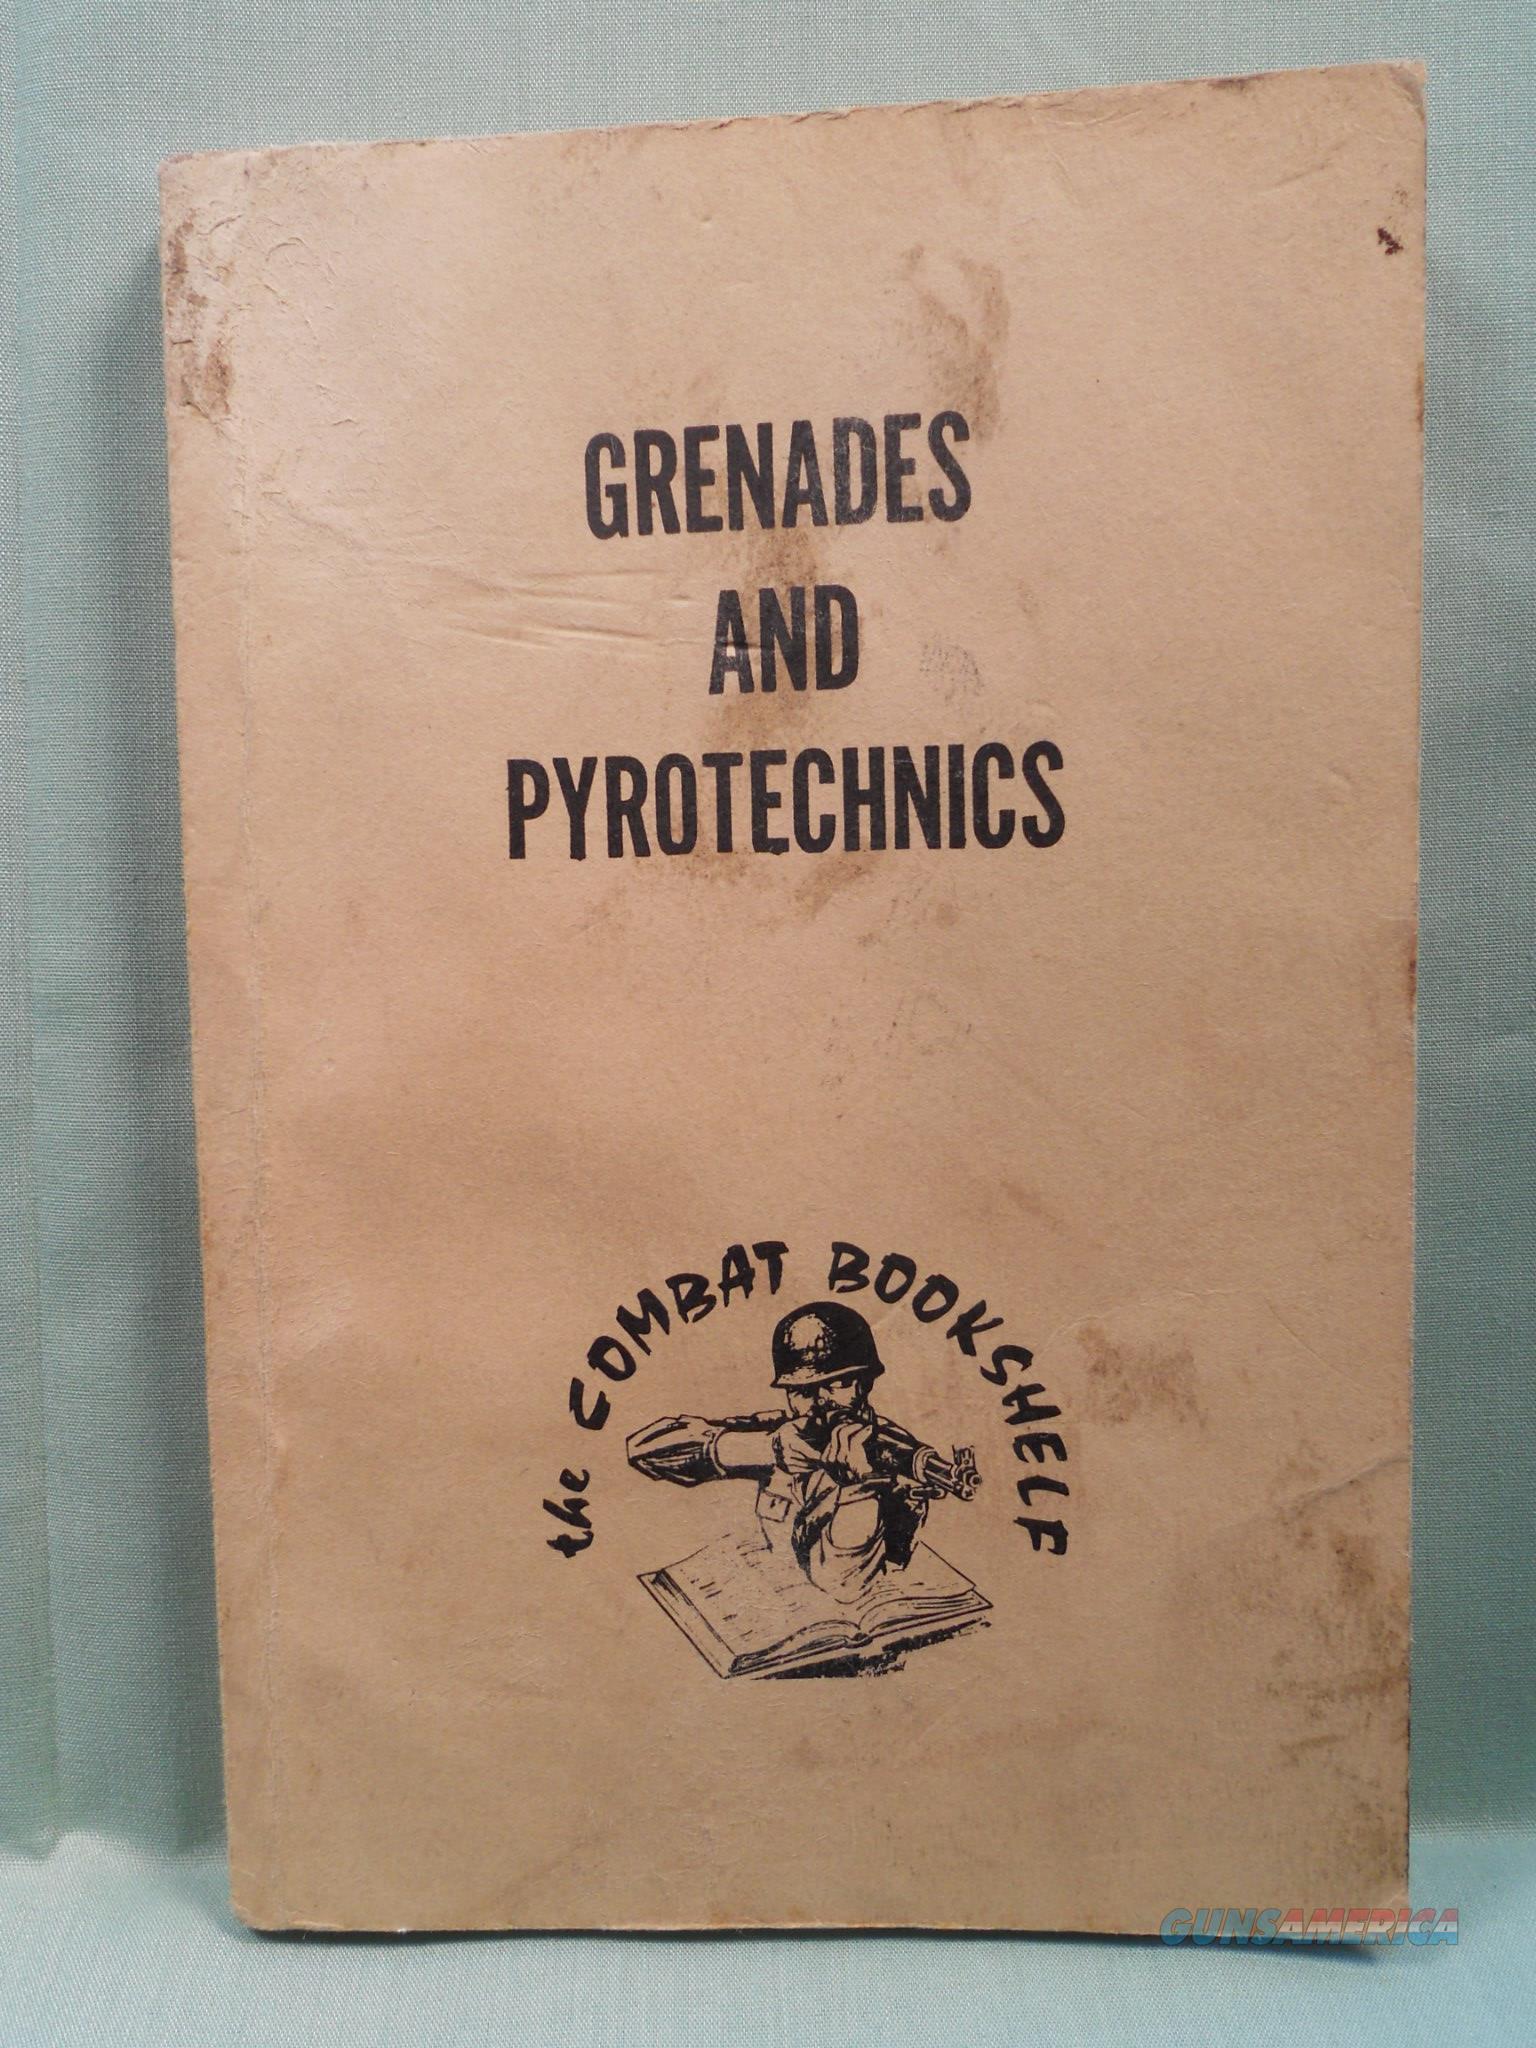 Grenades & Pyrotechnics Reprint Field Manual 23-30 Dept of the Army 1959/1968.   Non-Guns > Manuals - Print